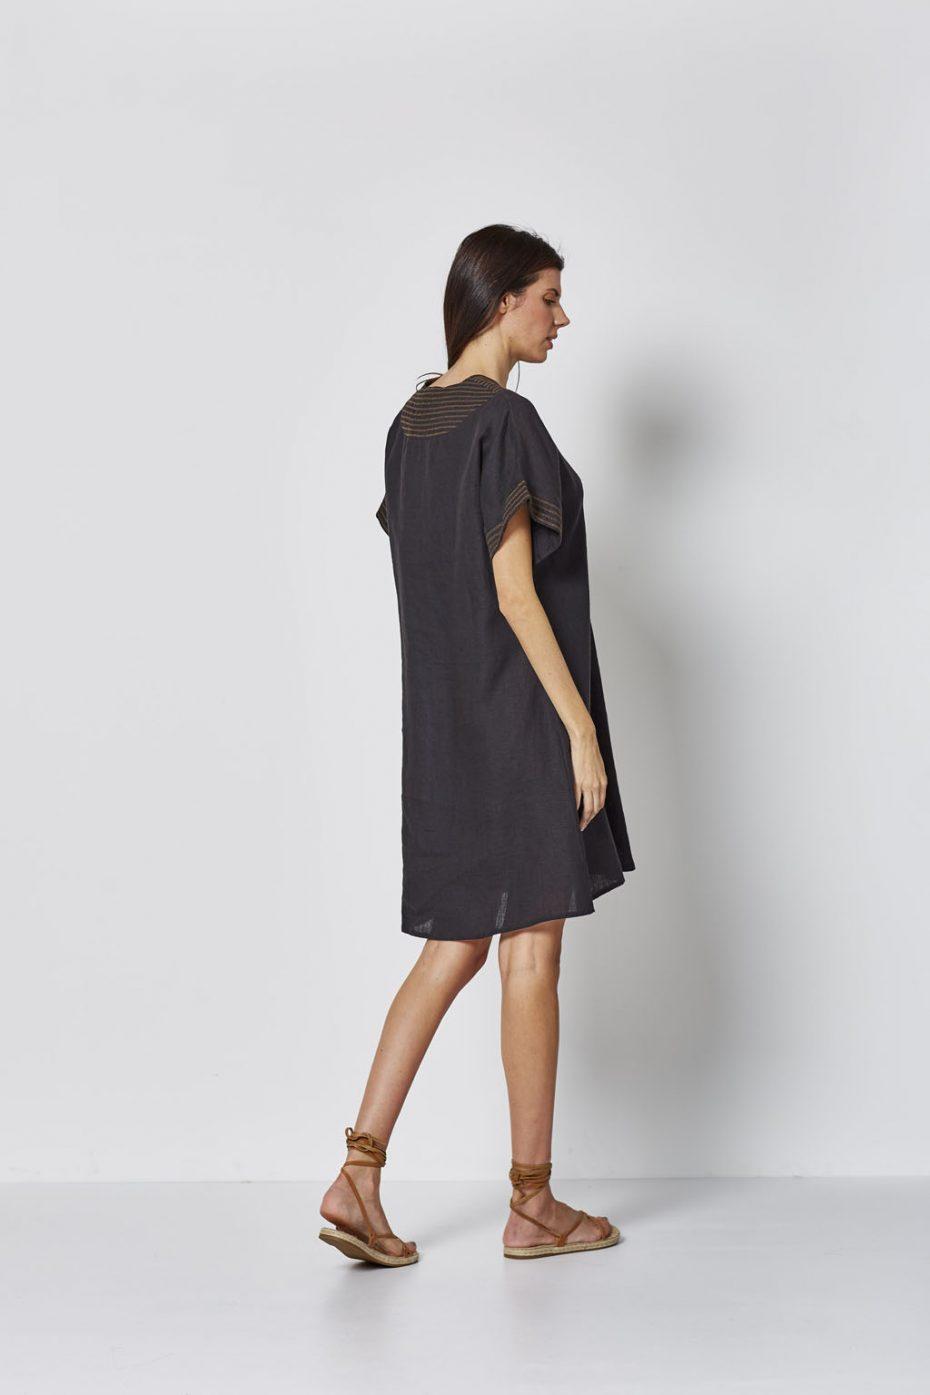 Vestido Corto Lino Bordado Negro de Vandos